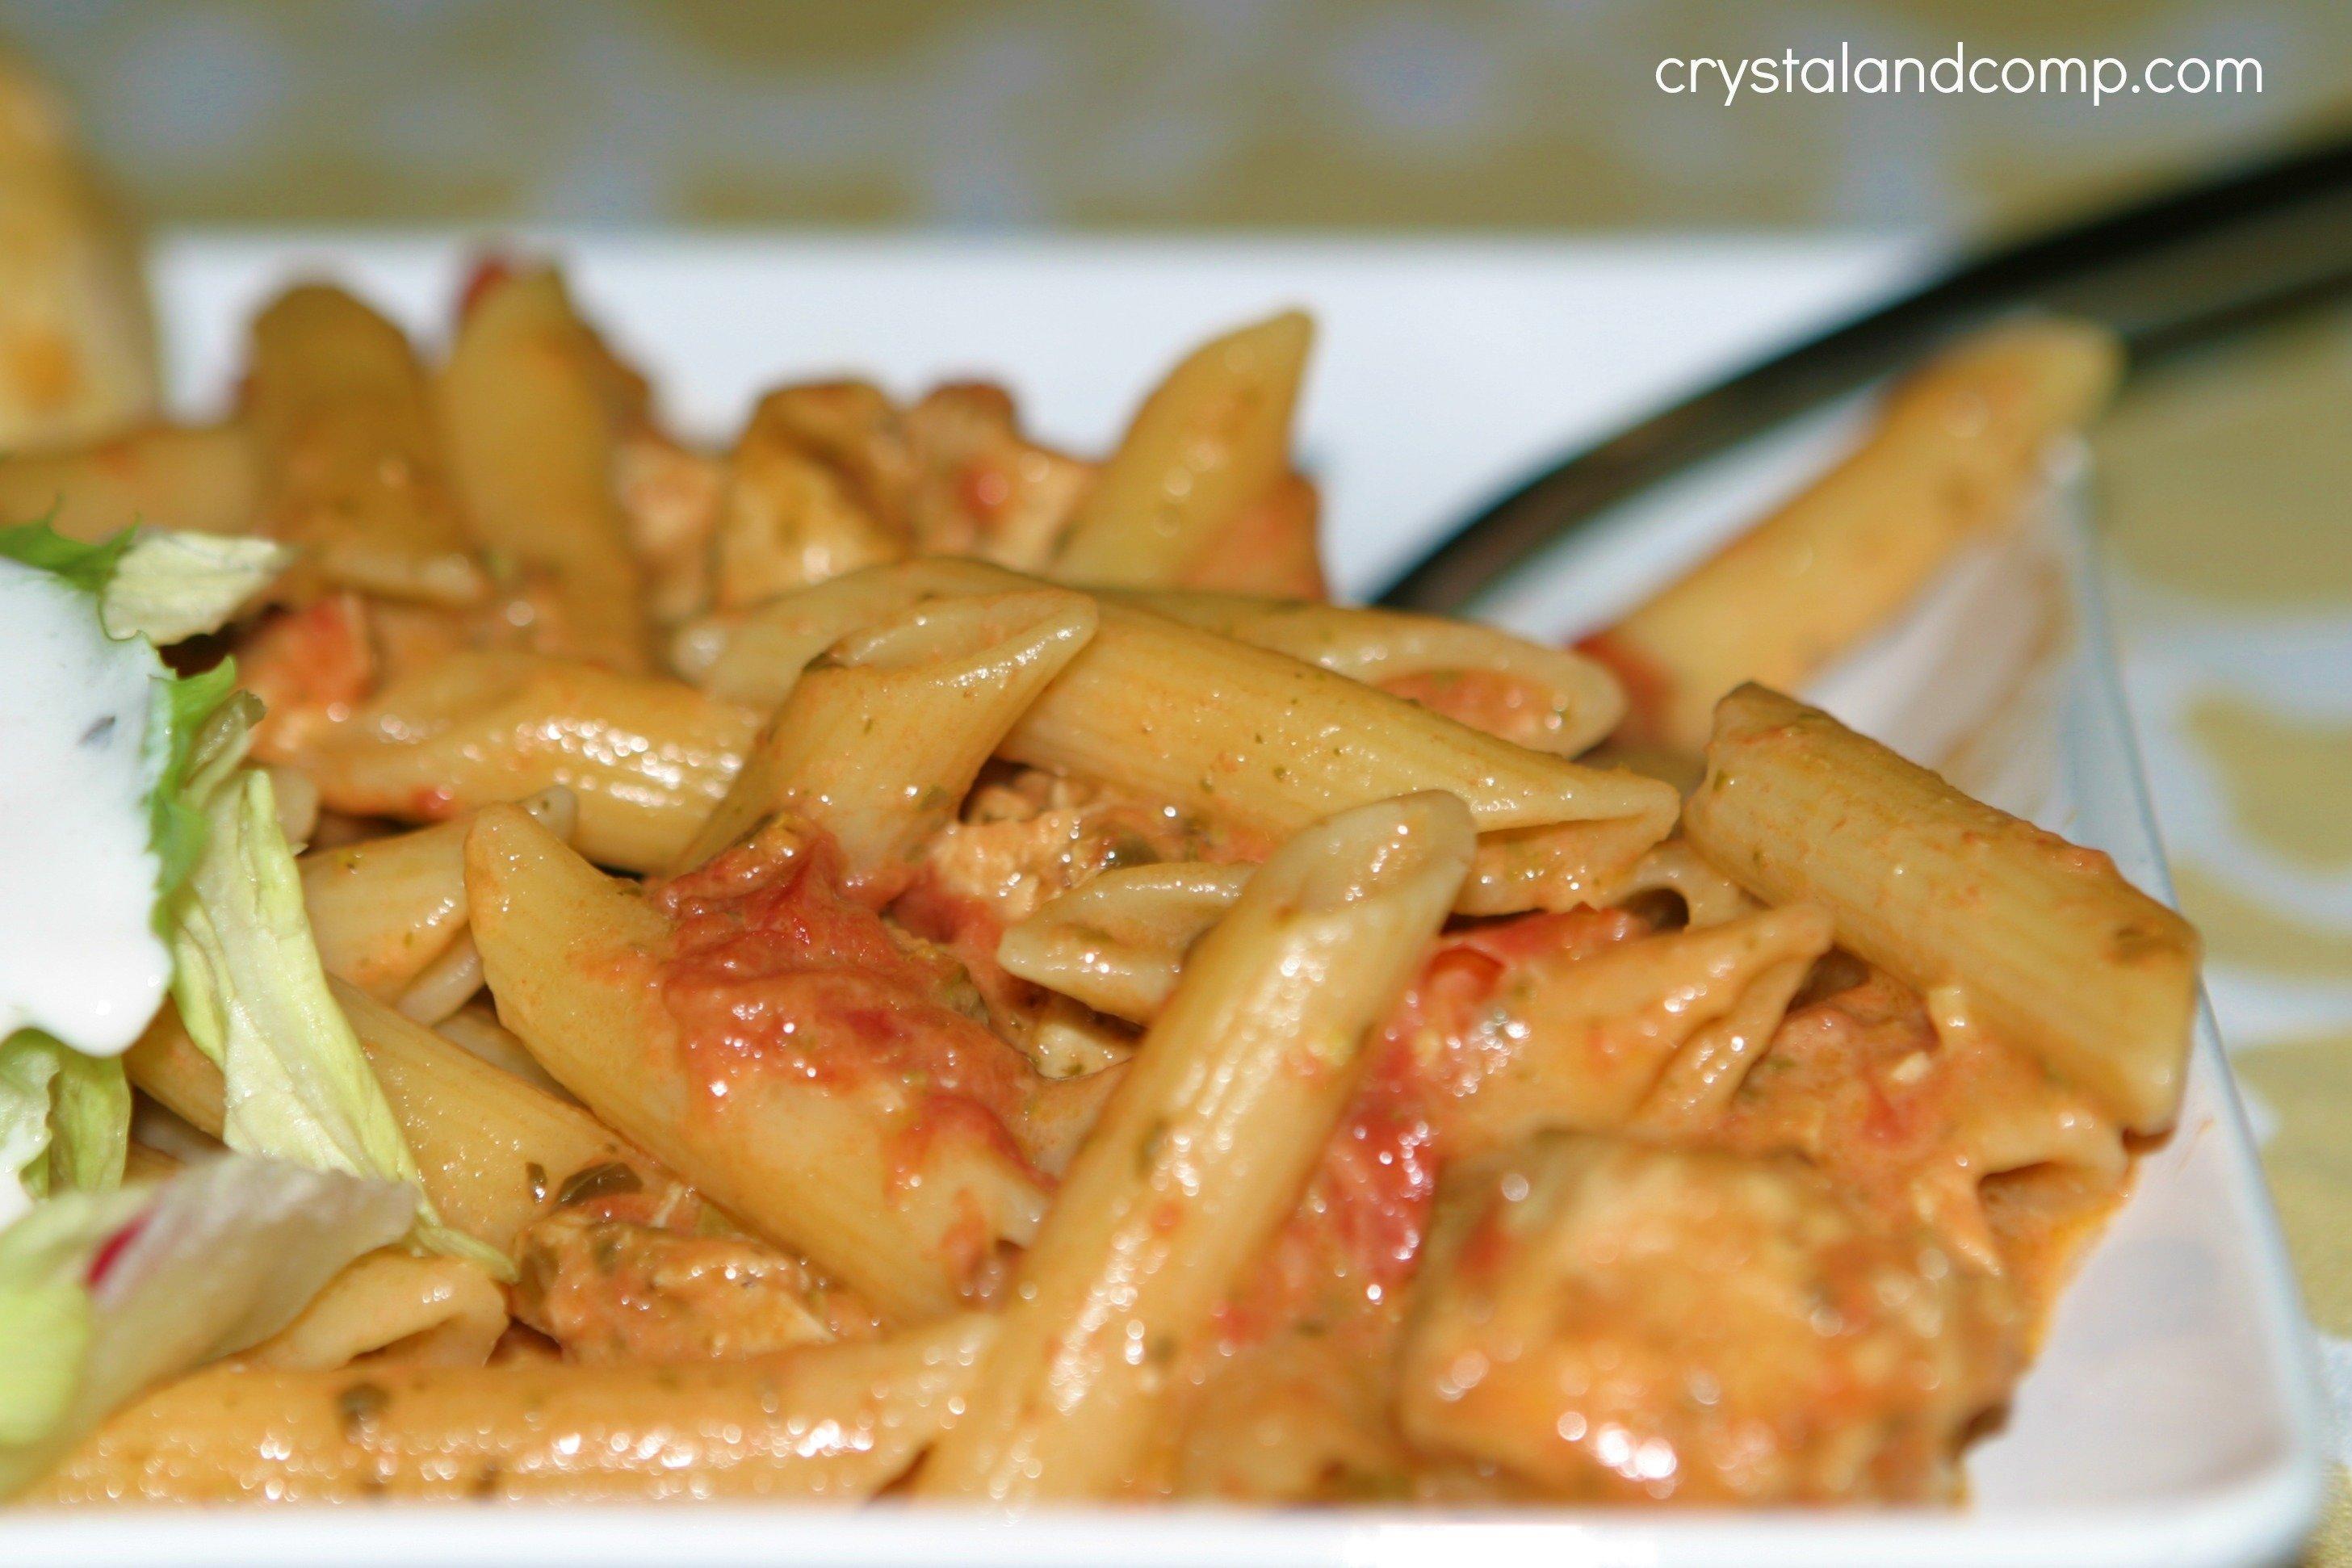 10 Attractive Easy Dinner Ideas With Chicken easy recipes vodka chicken pasta no alcohol recipe 1 2020